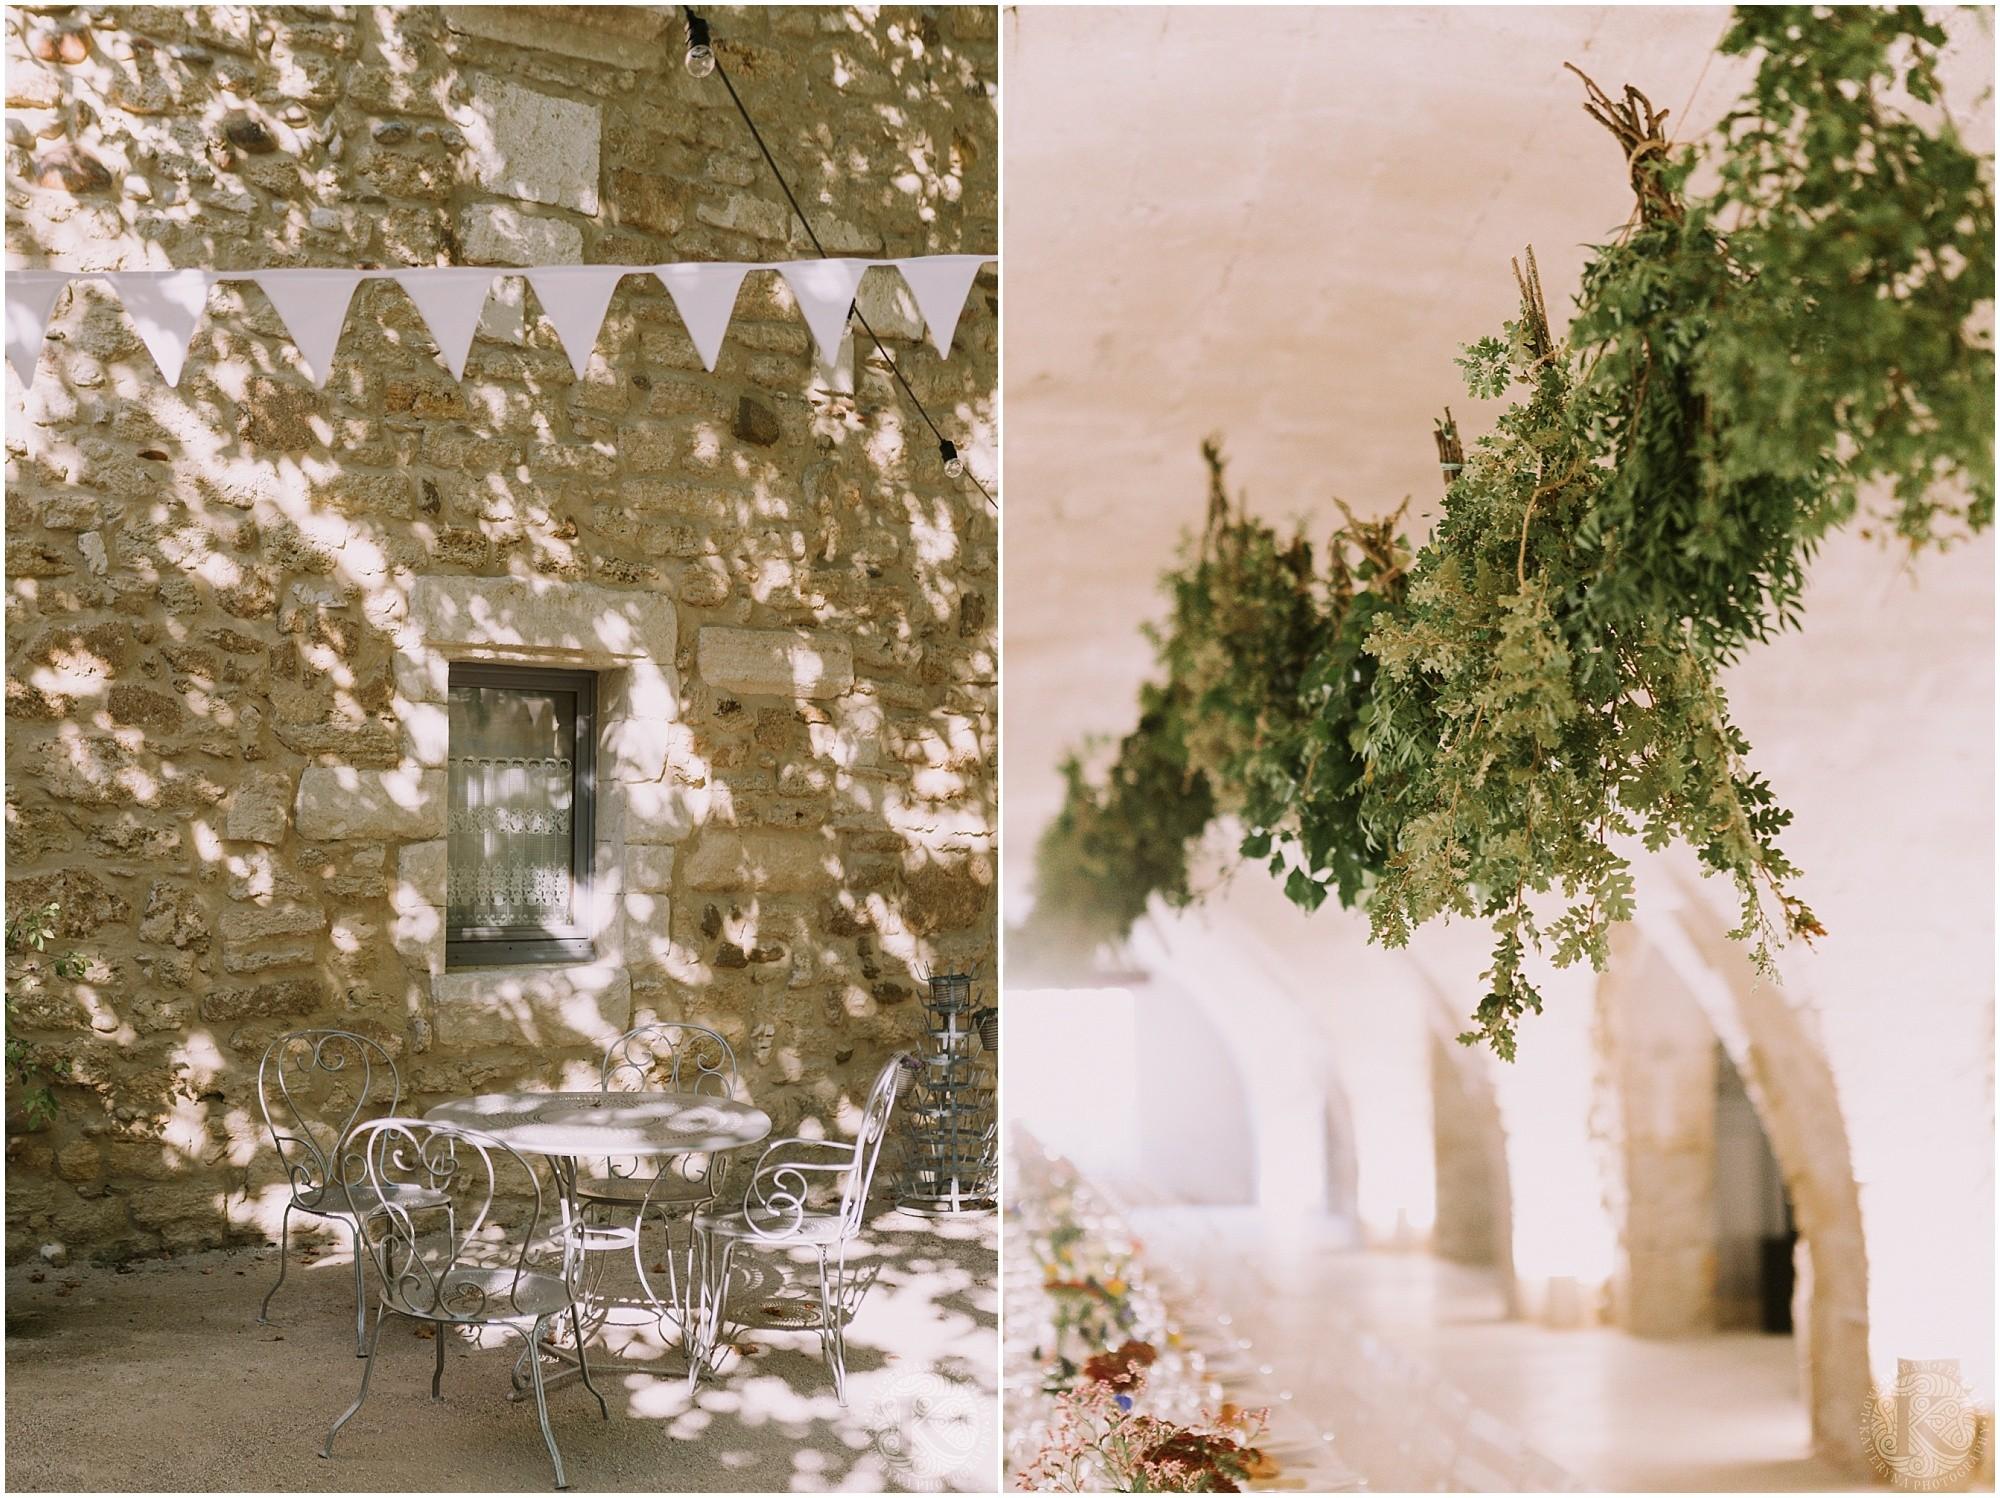 Kateryna-photos-photographe-mariage-vaucluse-provence-avignon-ferme-st-hugues_0058.jpg